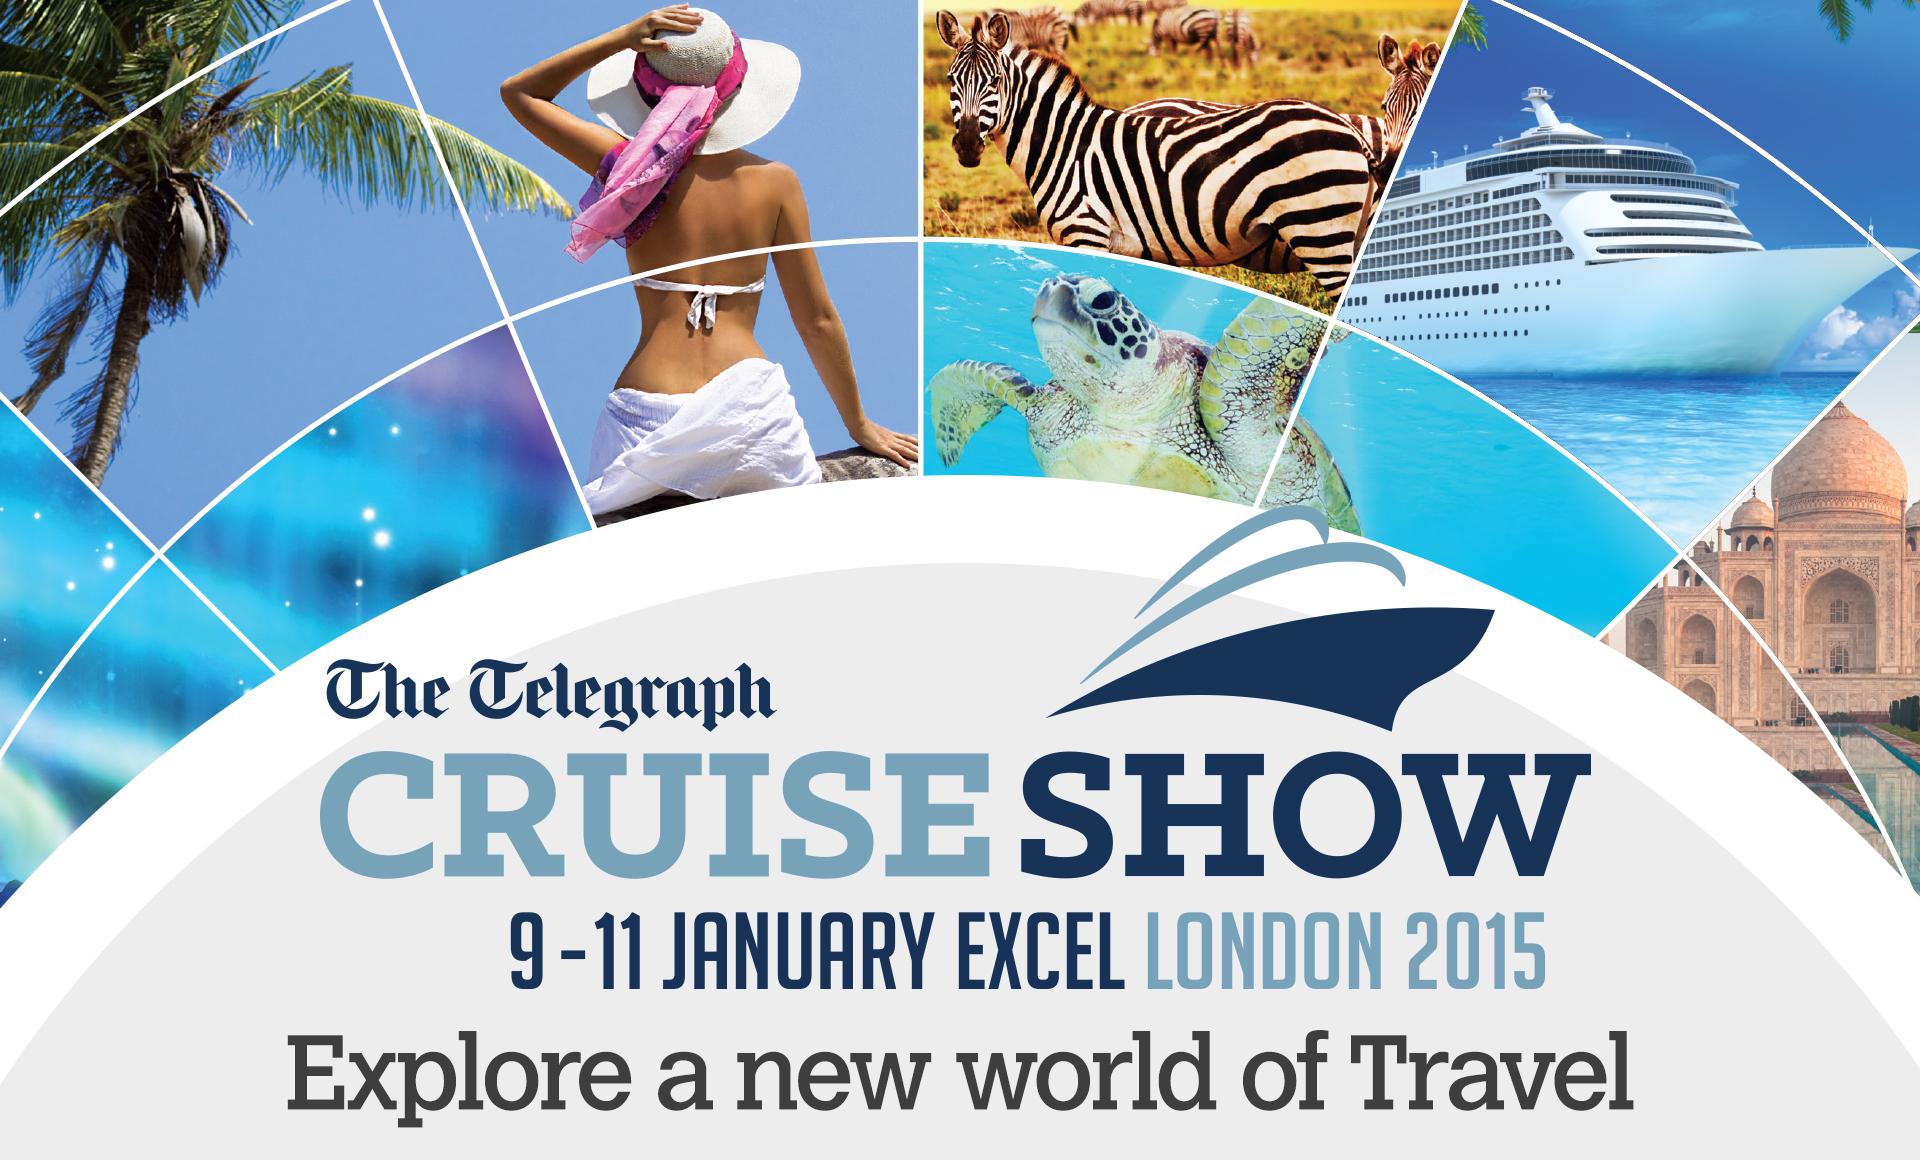 Telegraph Cruise Show 2015